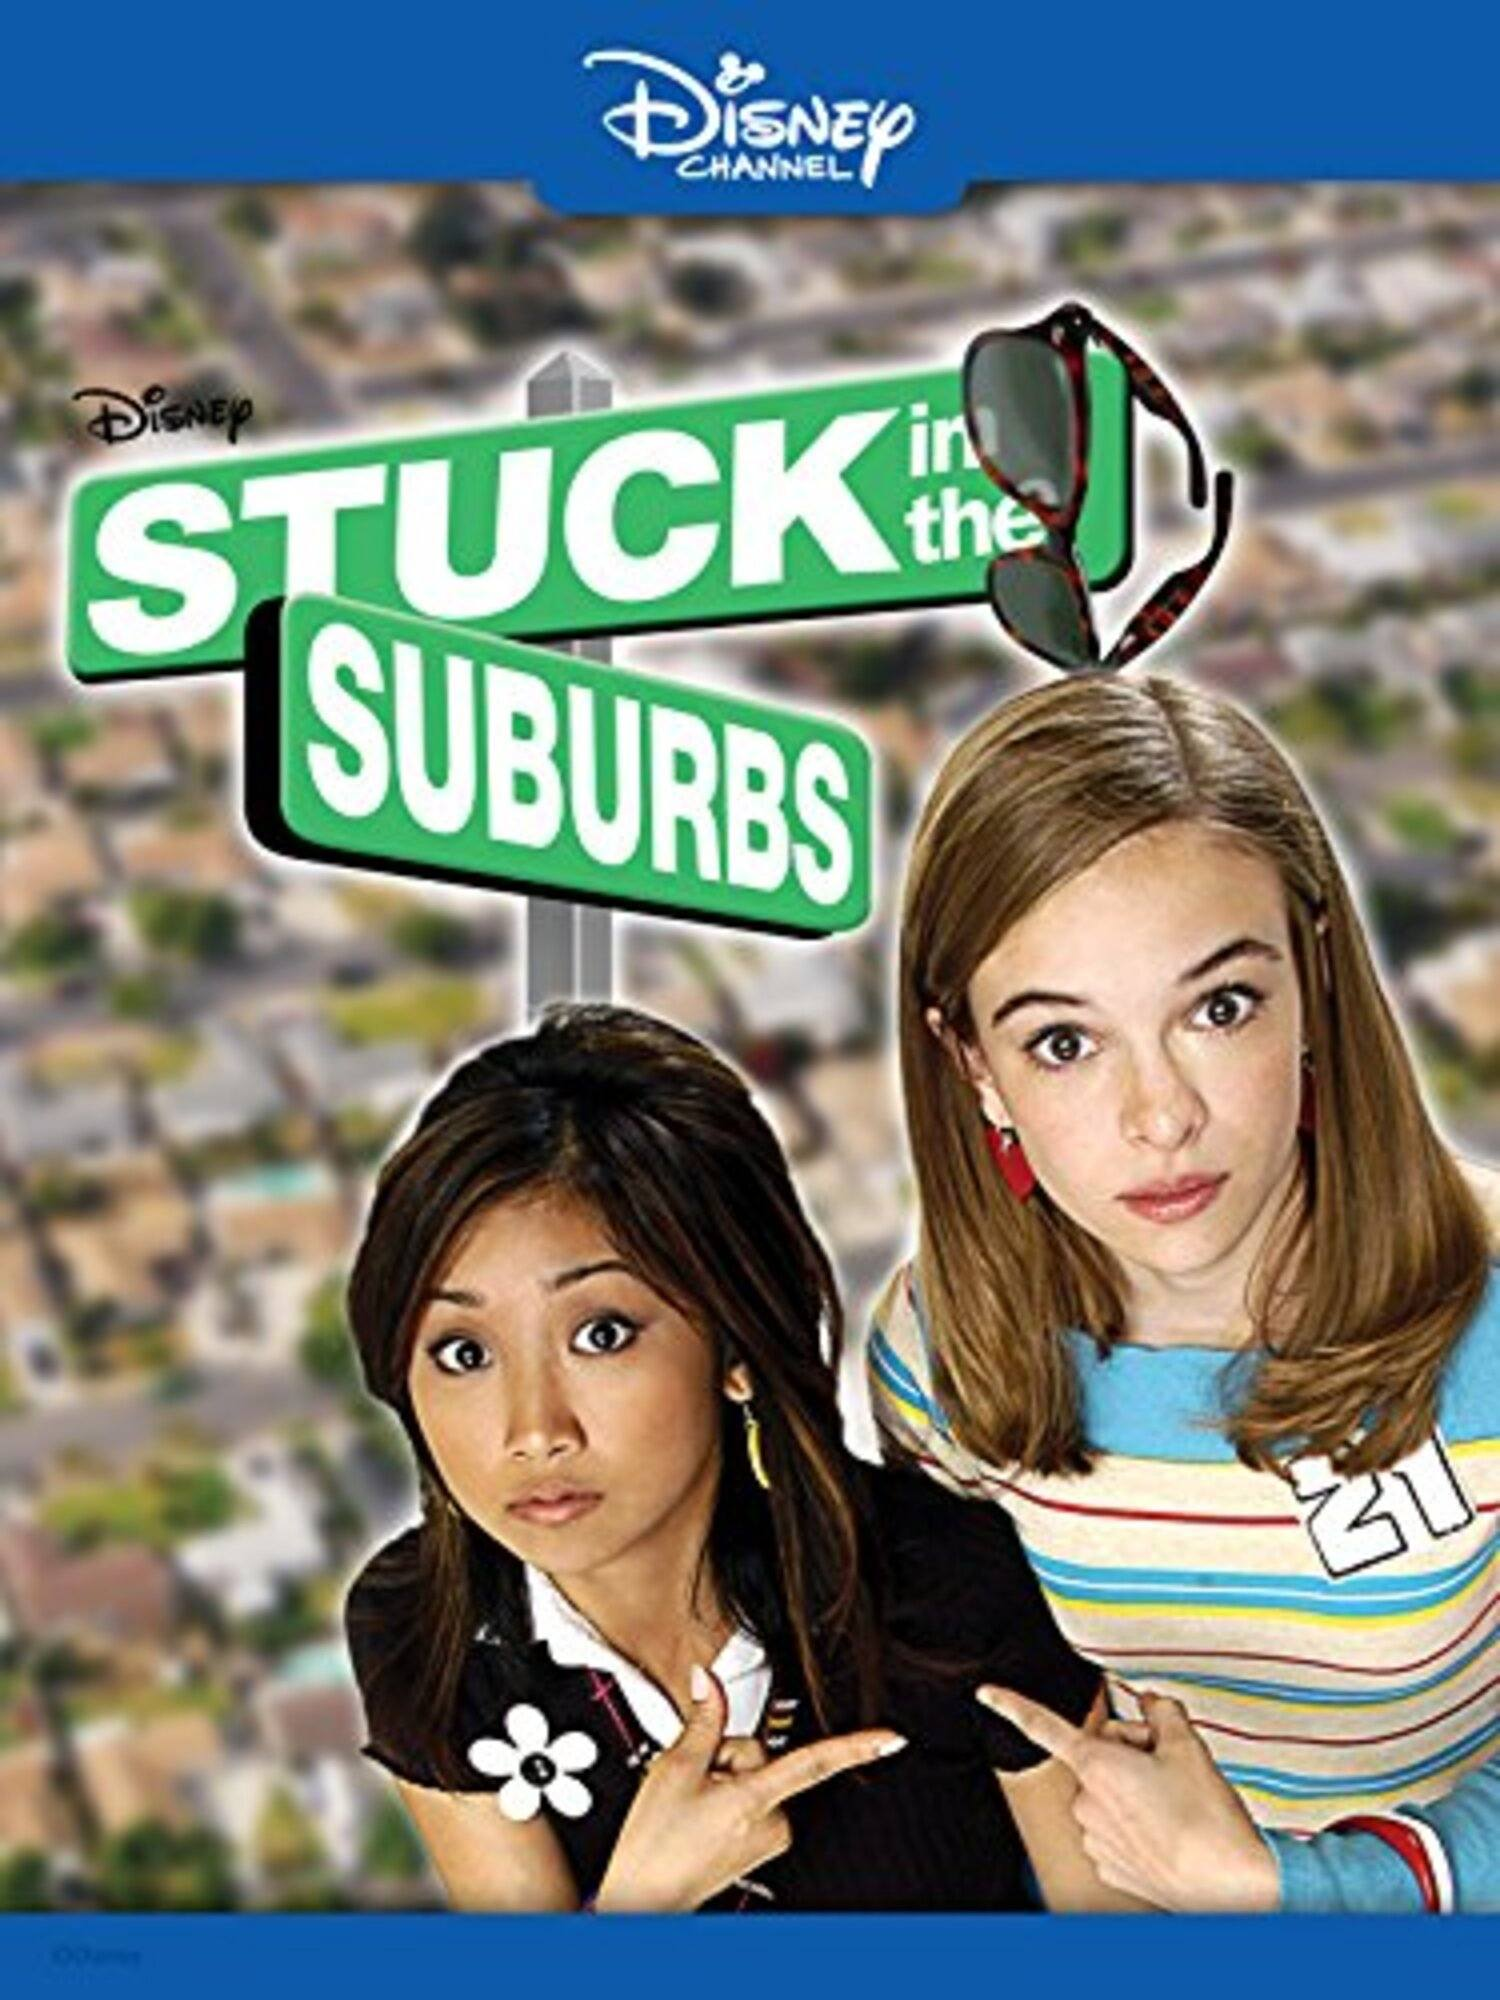 Affiche poster naissance nouvelle star stuck suburbs disney channel